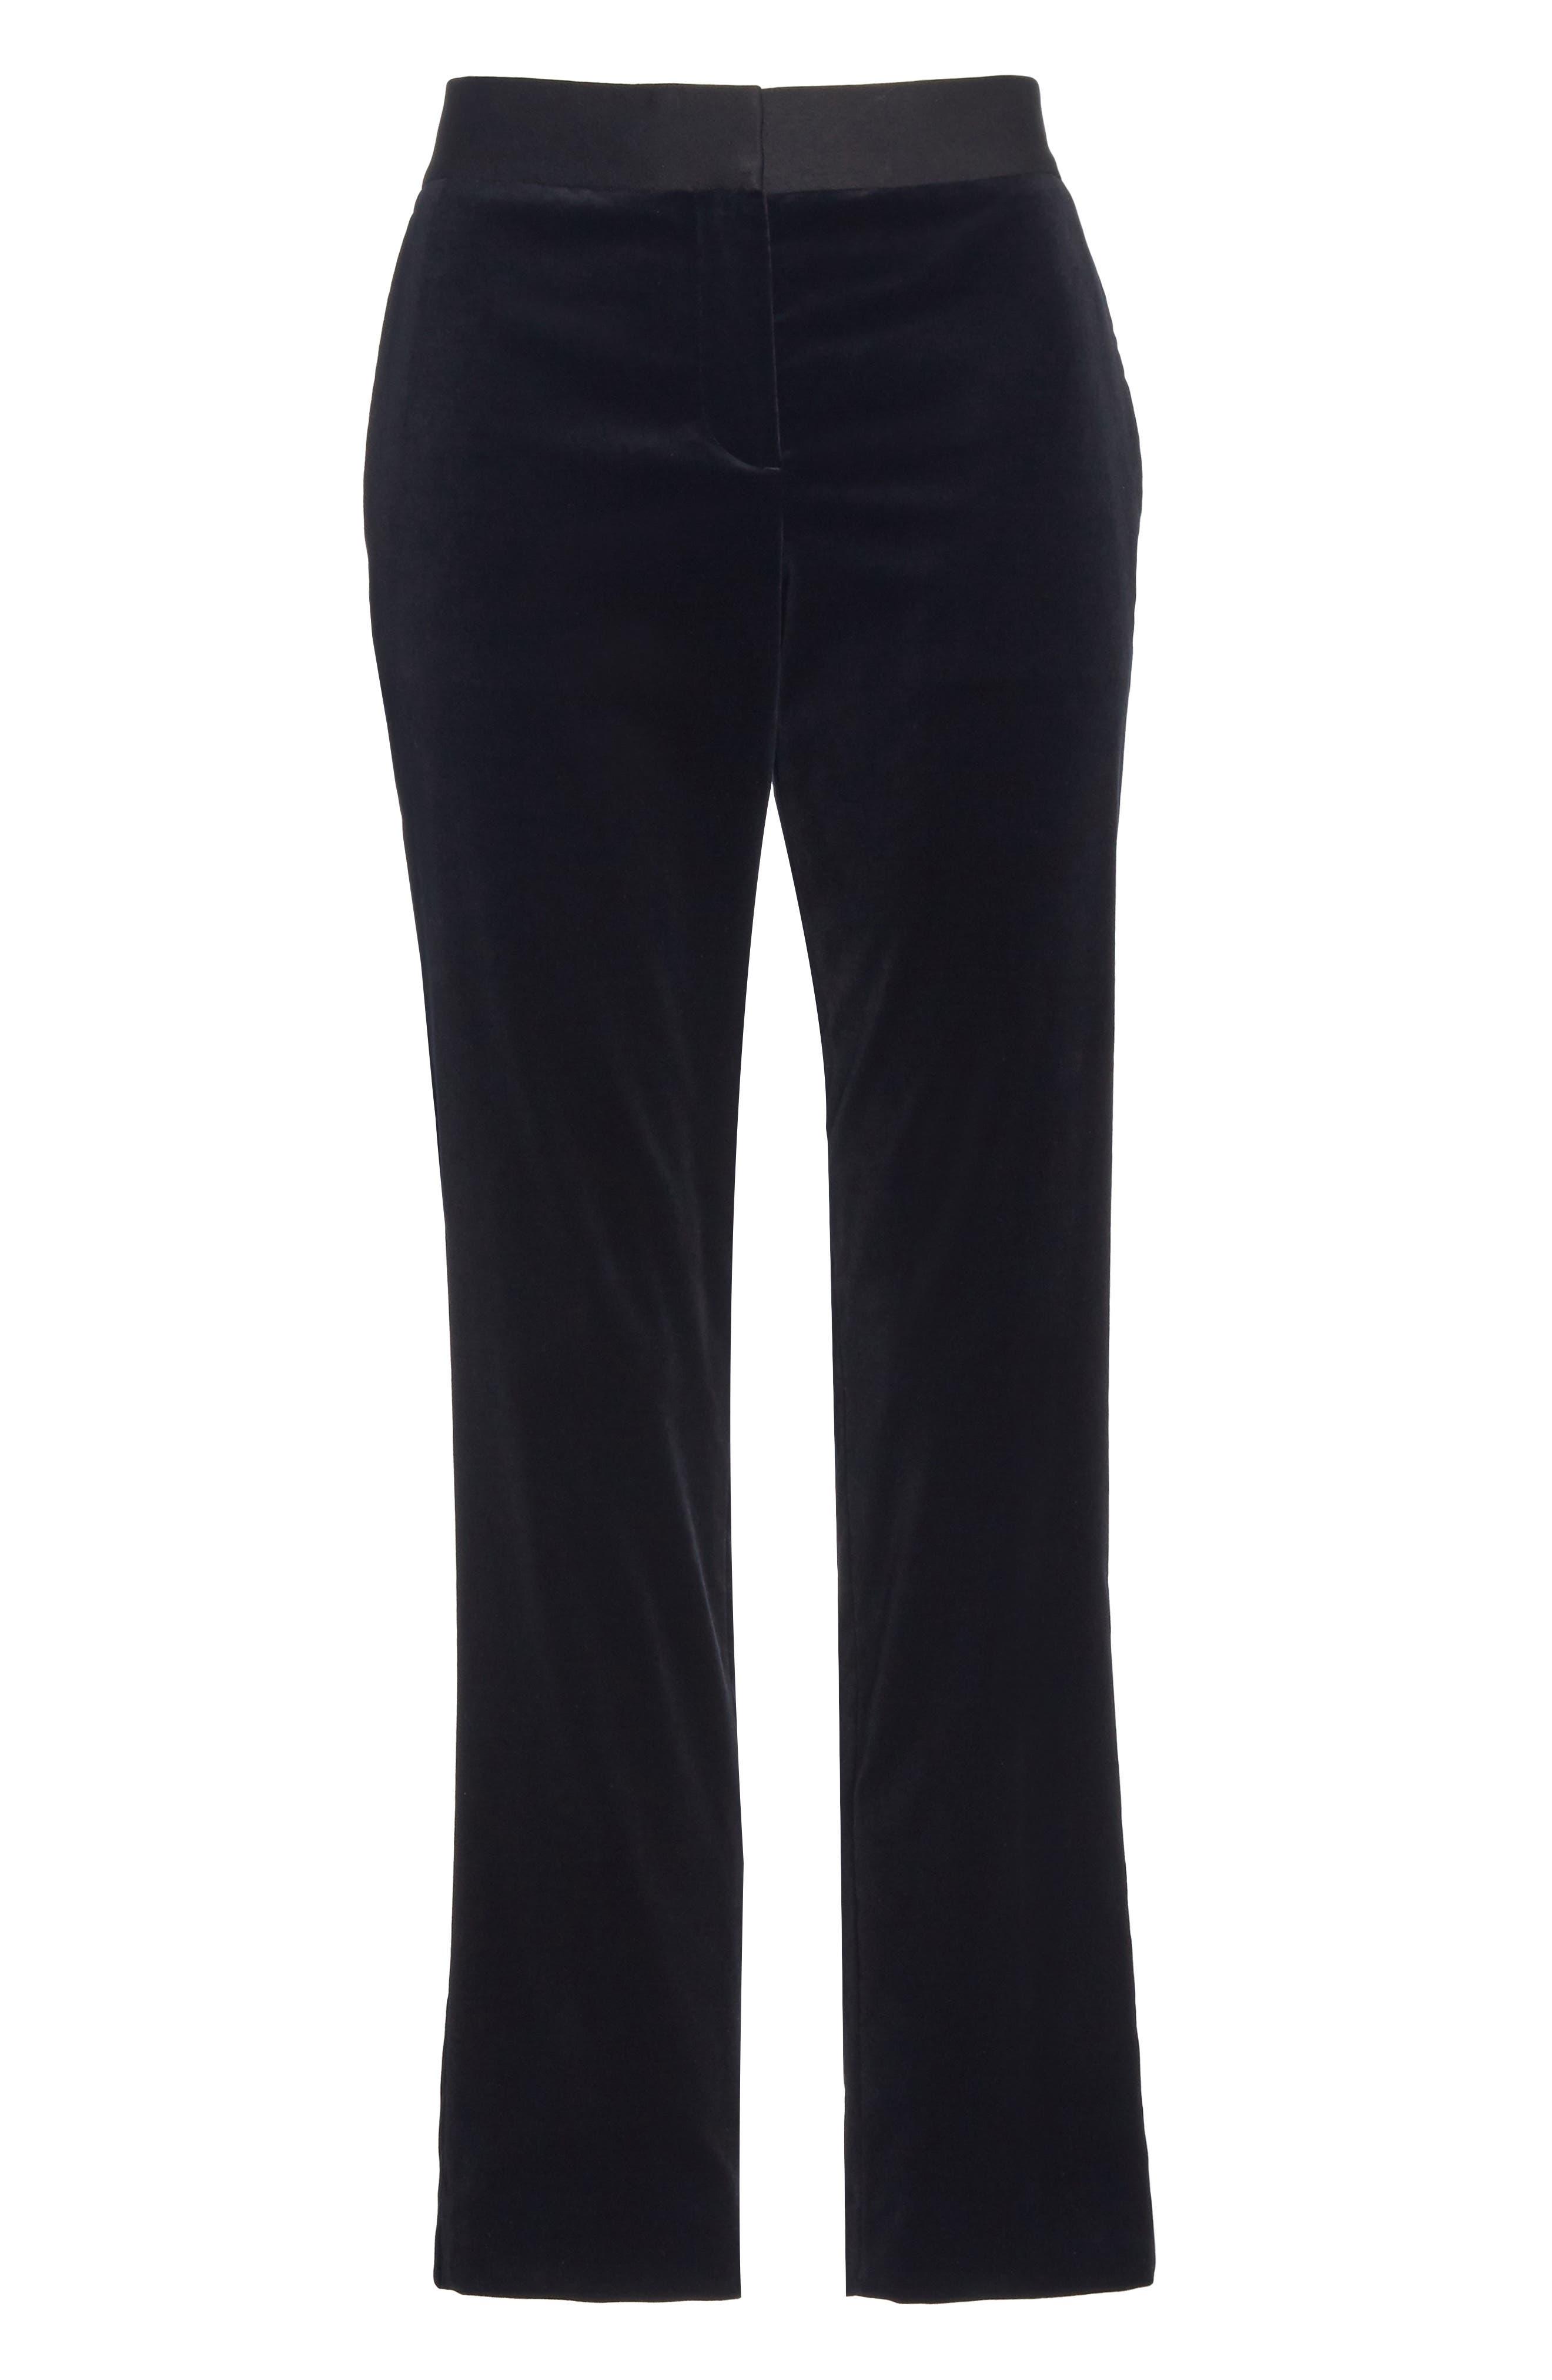 Stretch Cotton Velvet Trousers,                             Alternate thumbnail 6, color,                             001